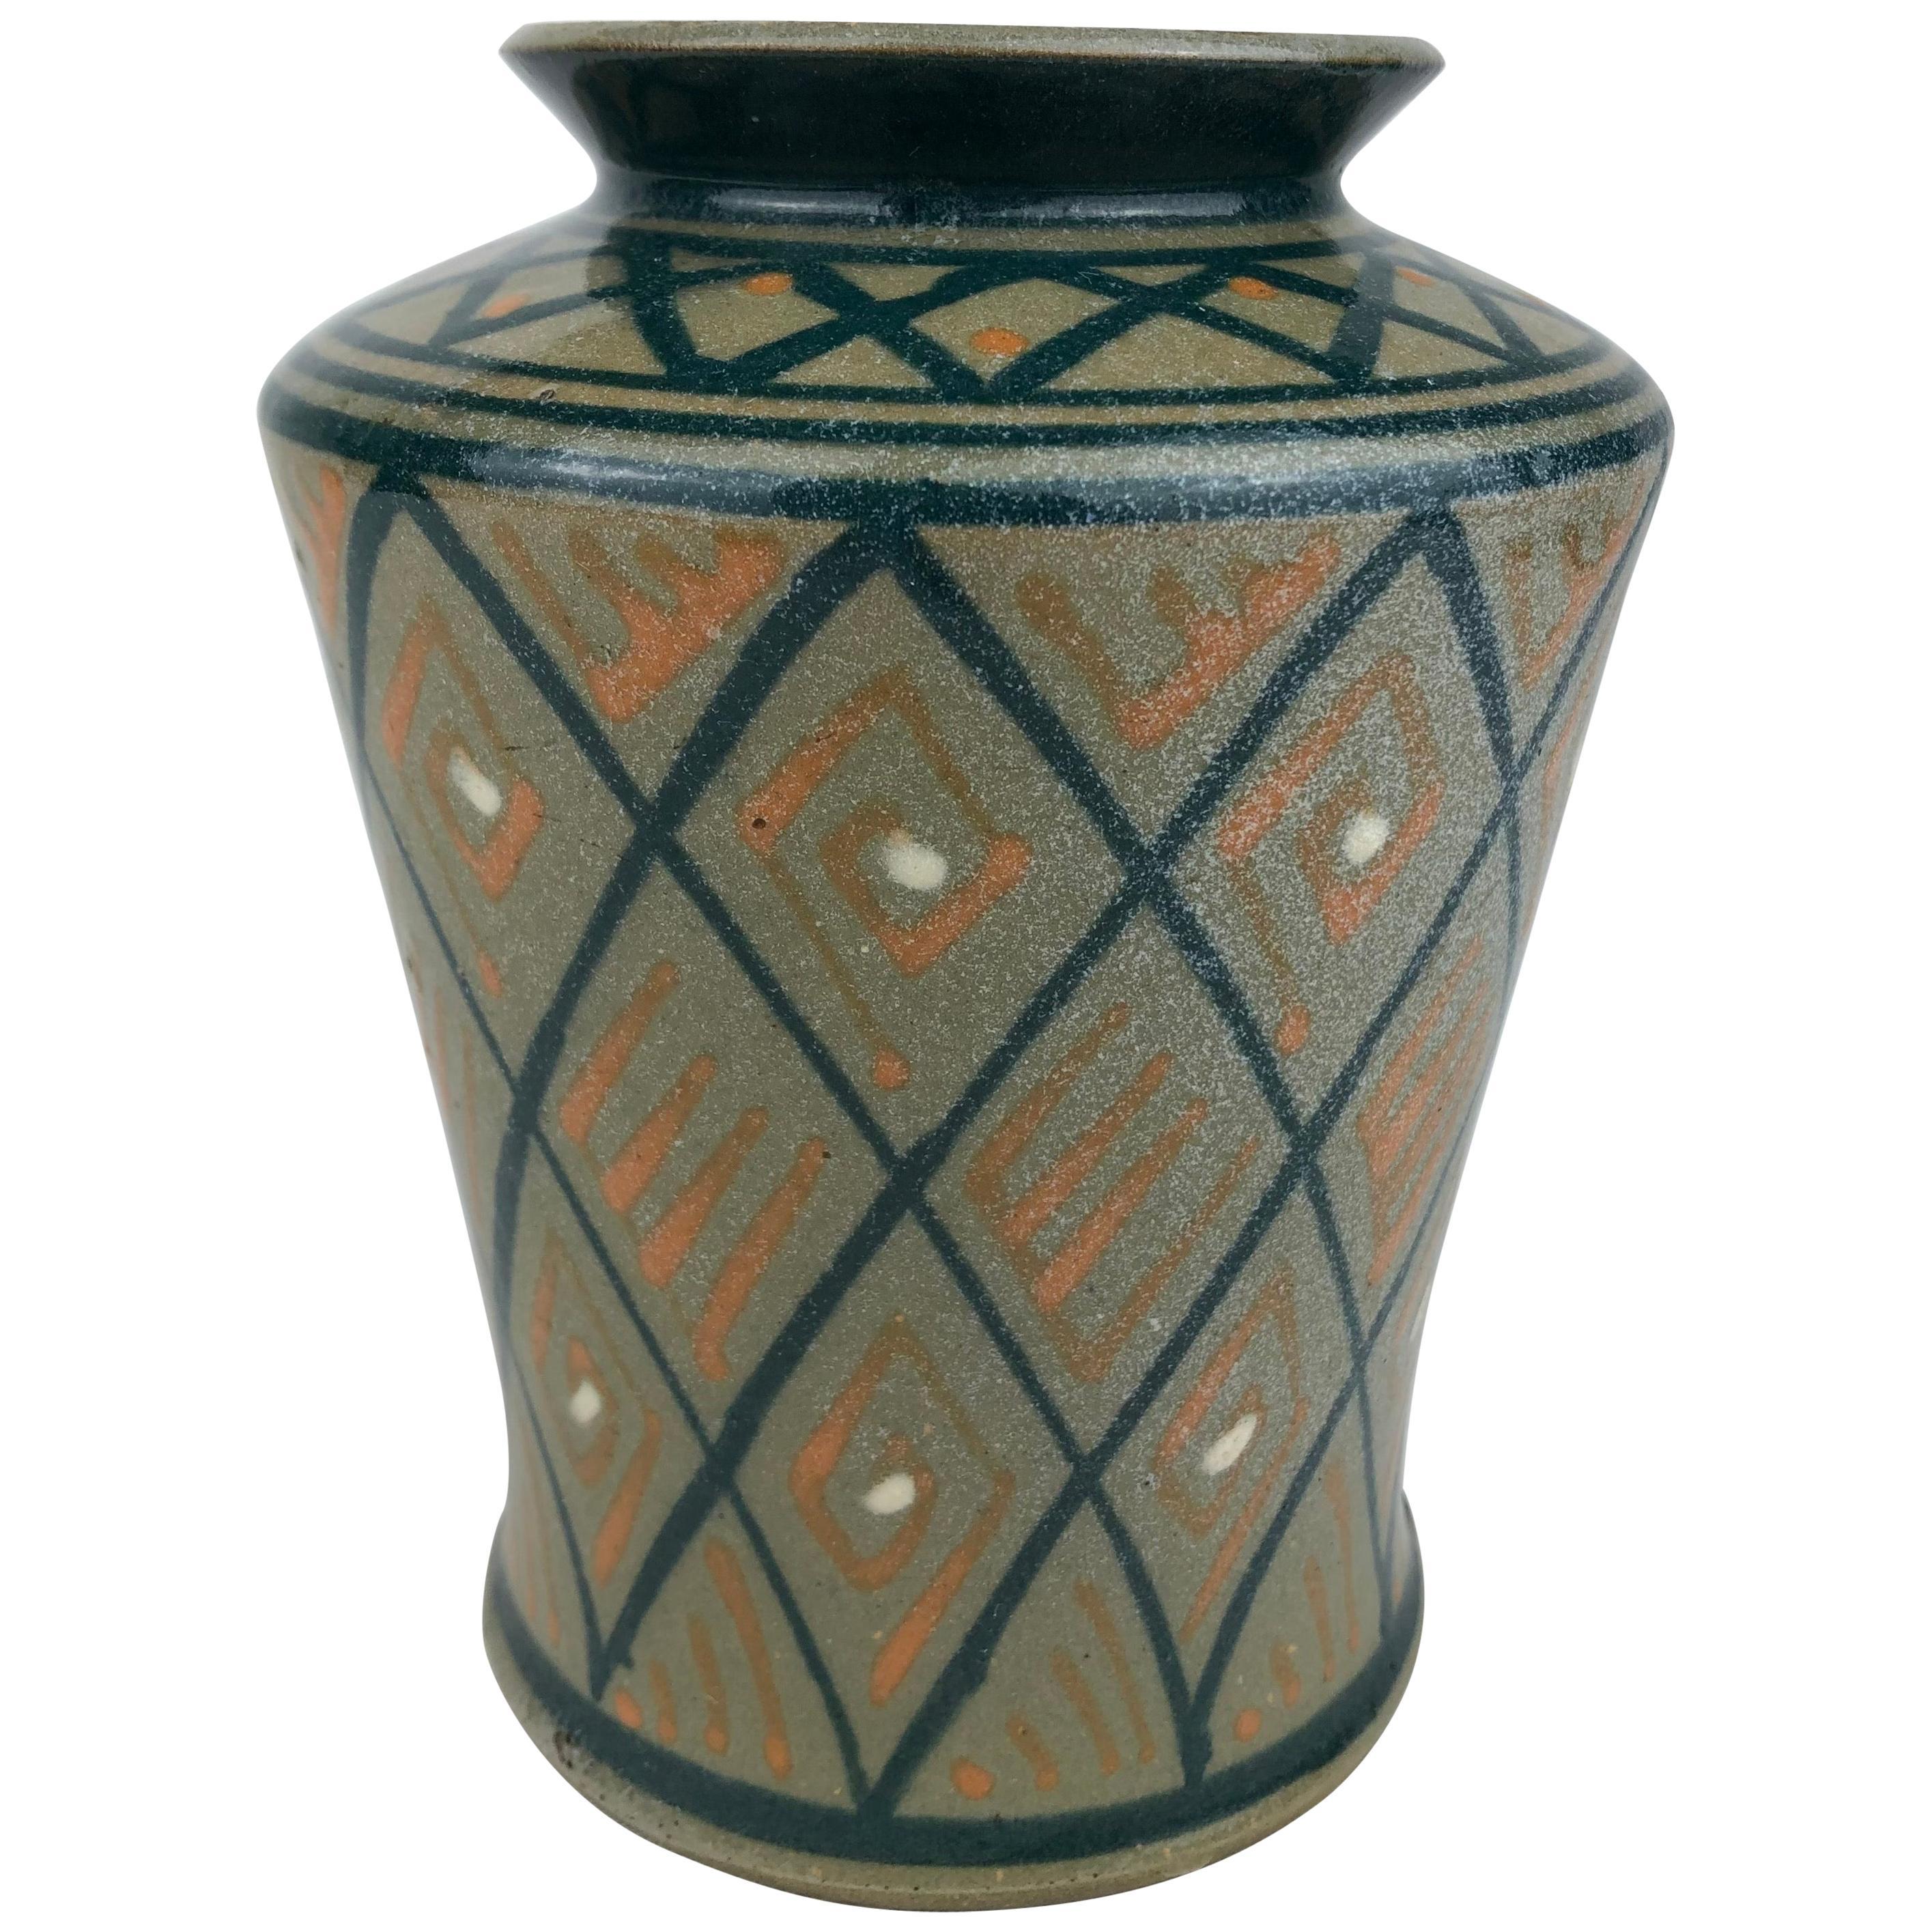 French Art Deco Ceramic Vase or Small Planter